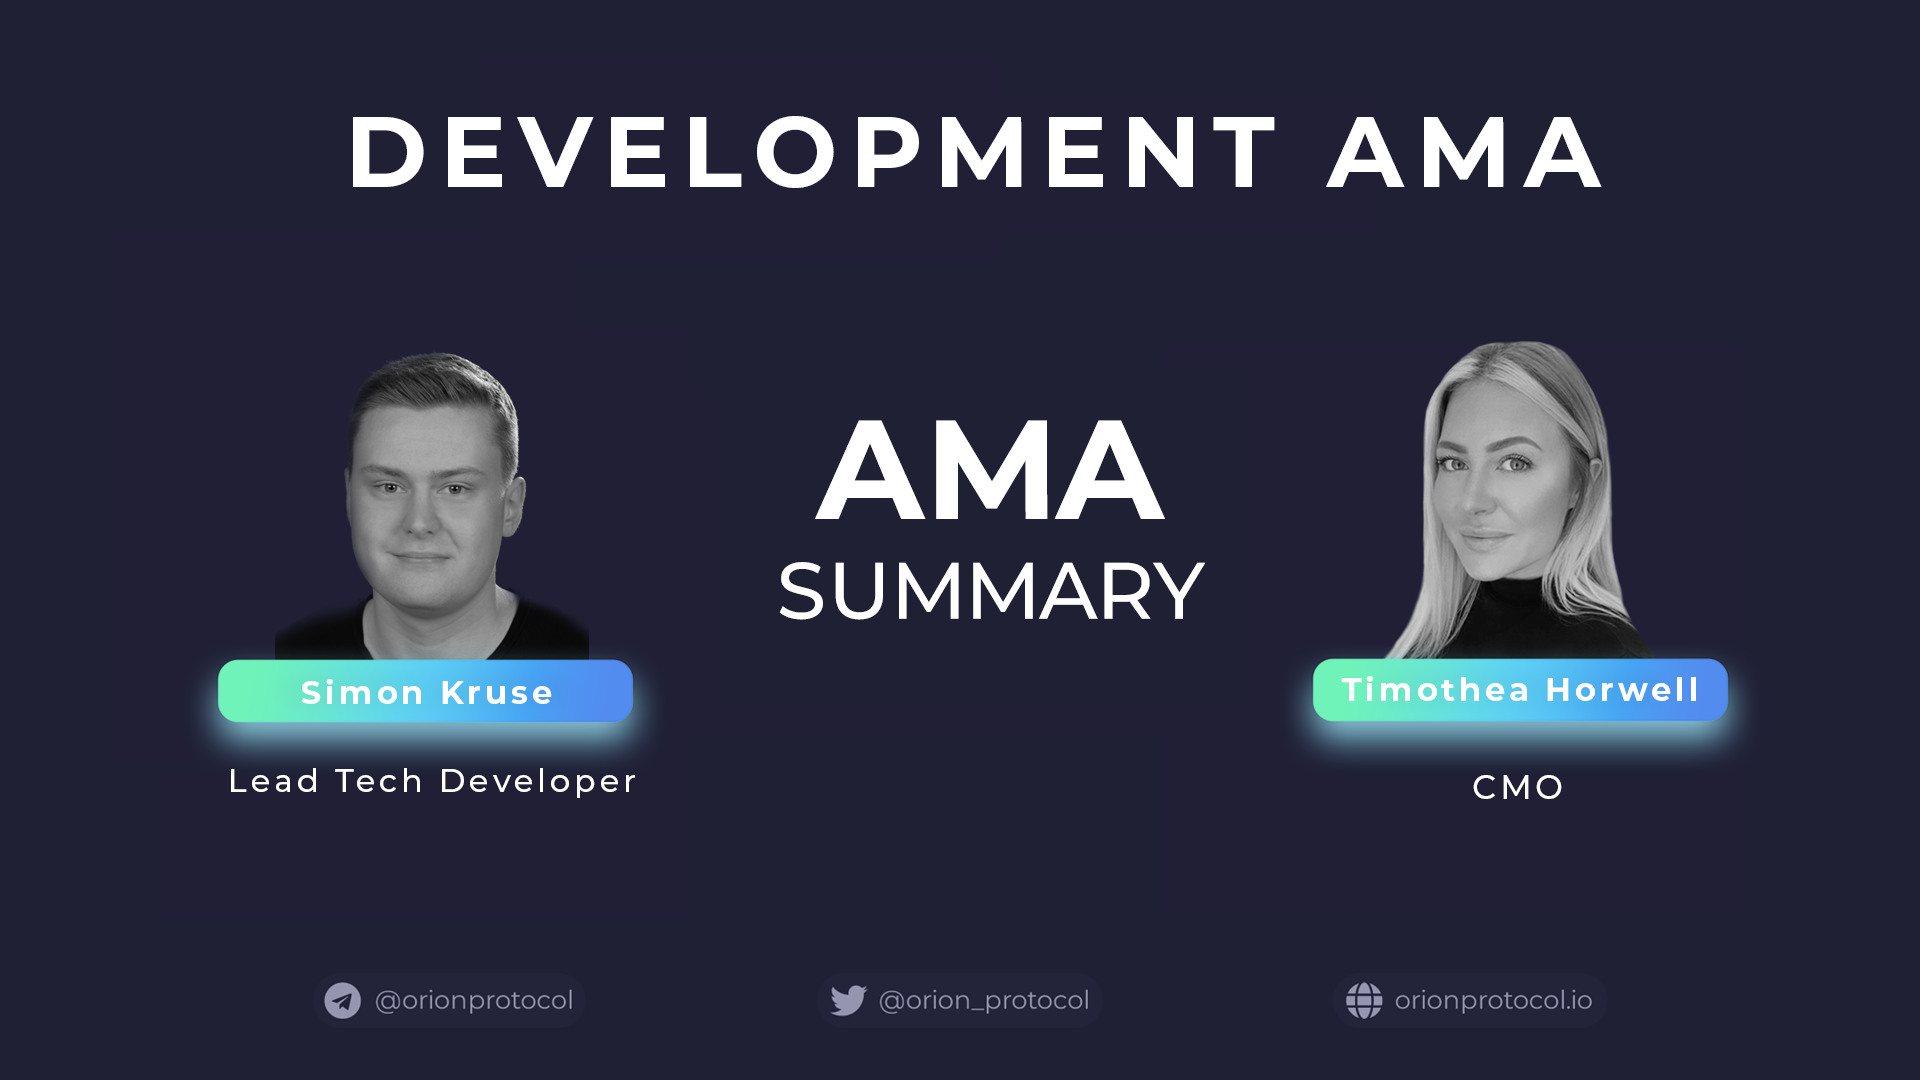 Development AMA